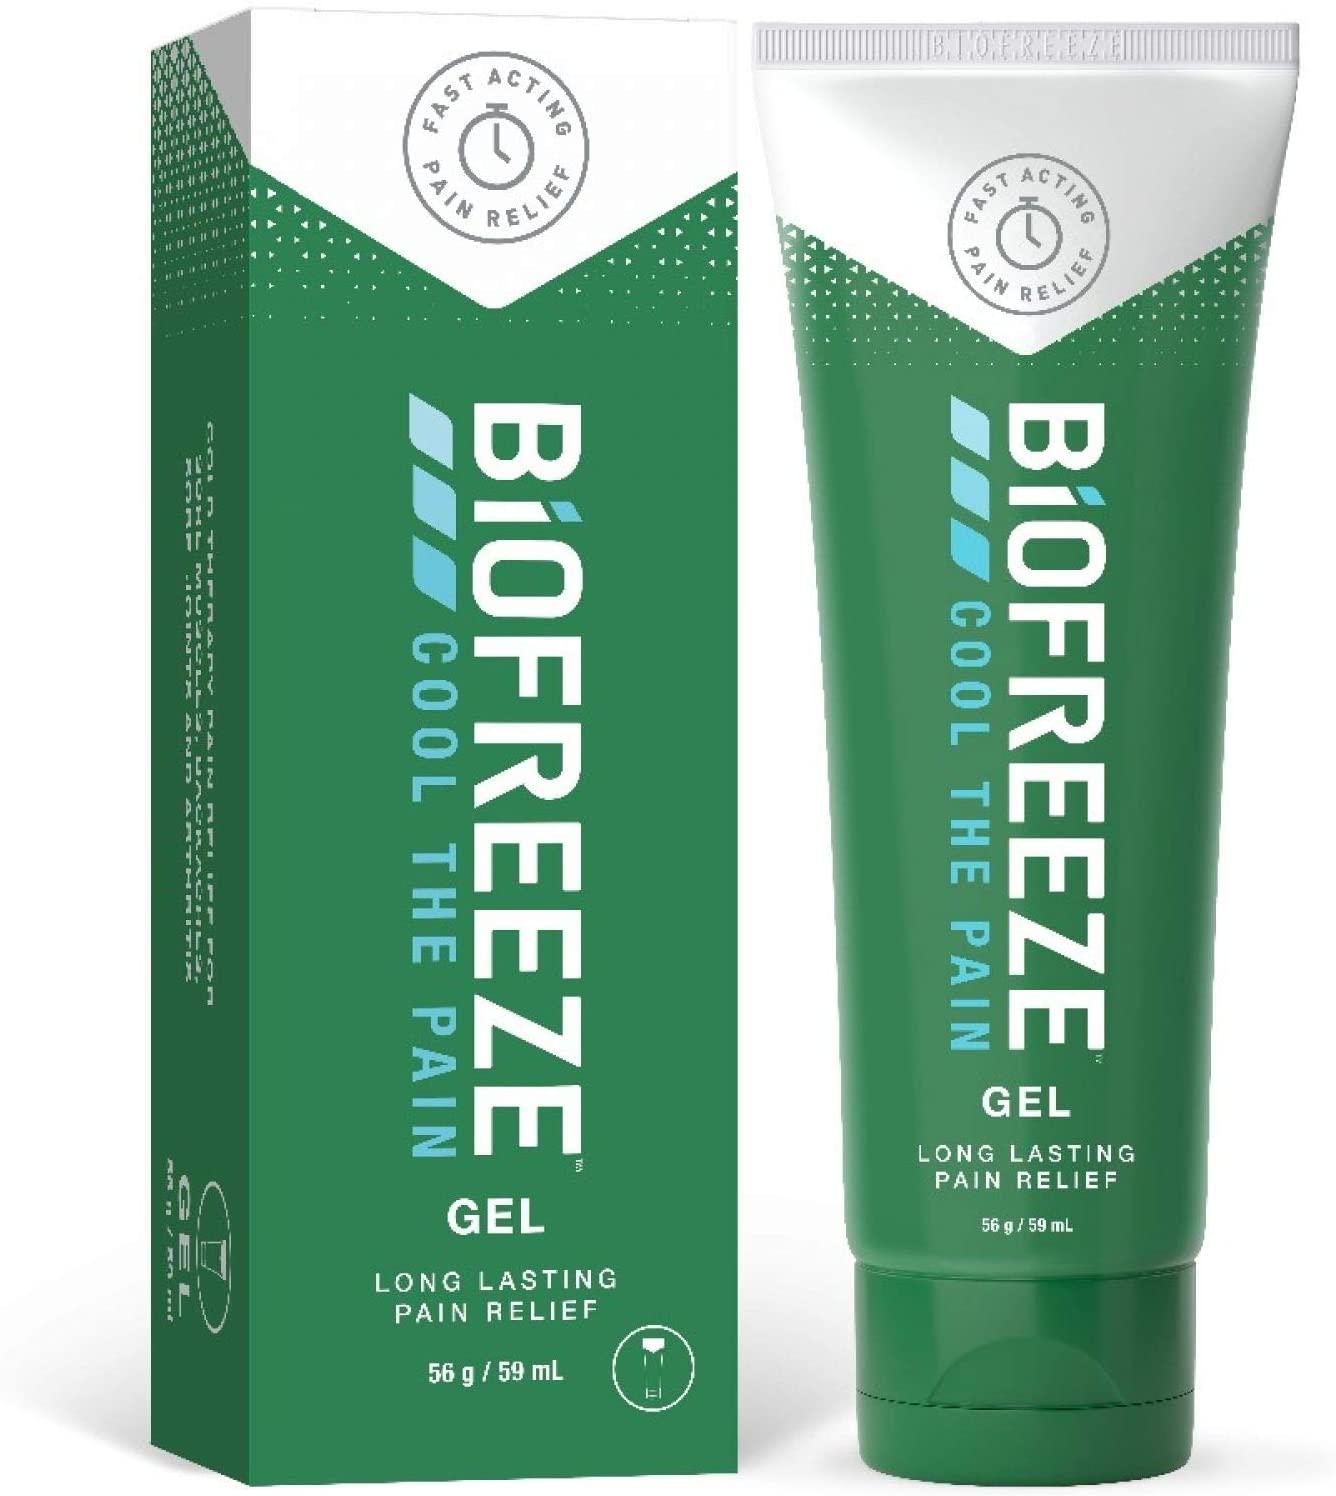 Biofreeze Gel 59ml by Biofreeze